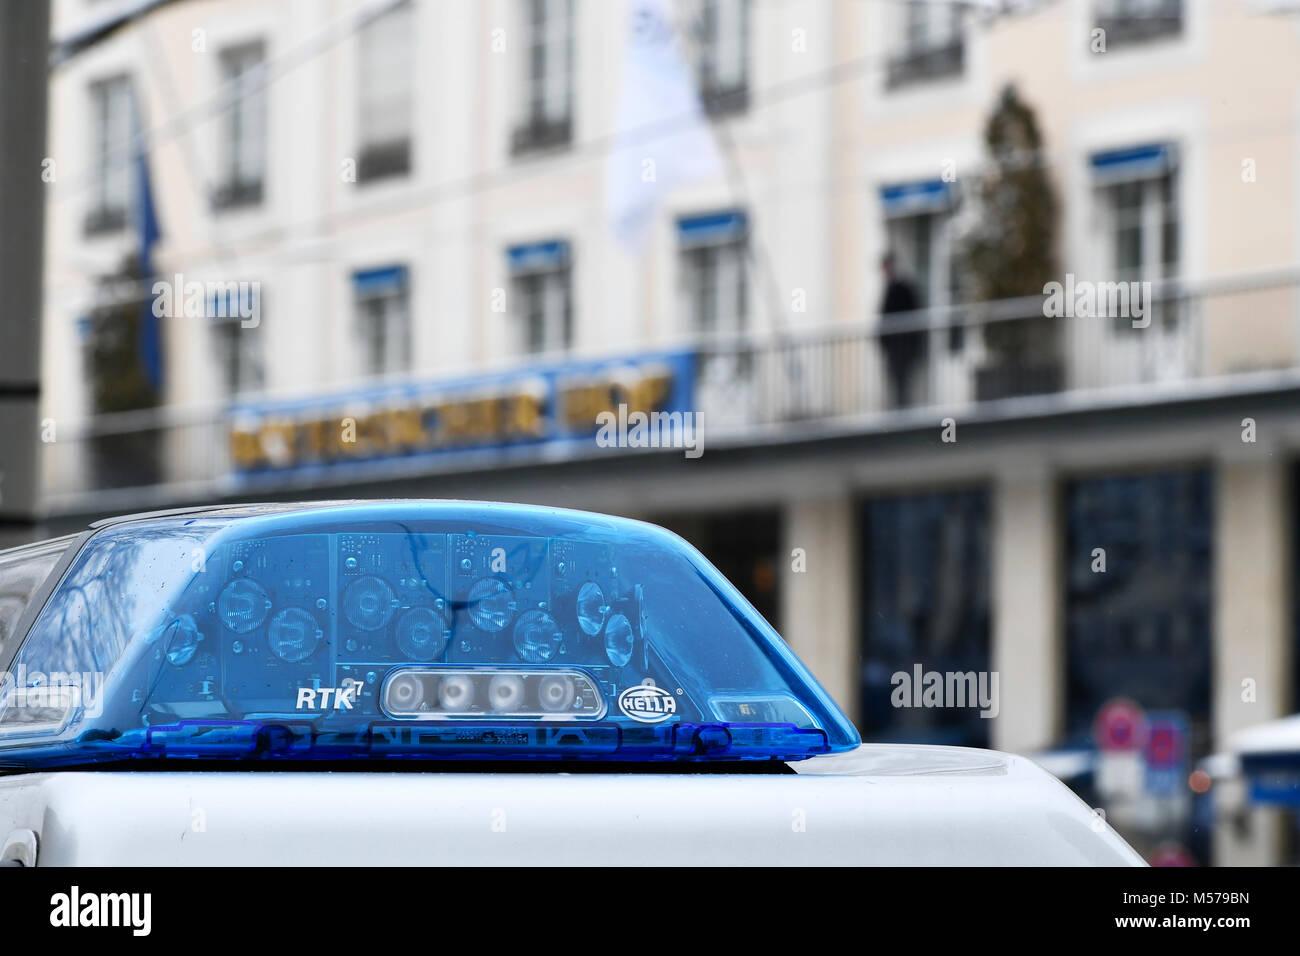 Police, Car, Blue, Flash, Flashing, Light, Lights, LED, VIP